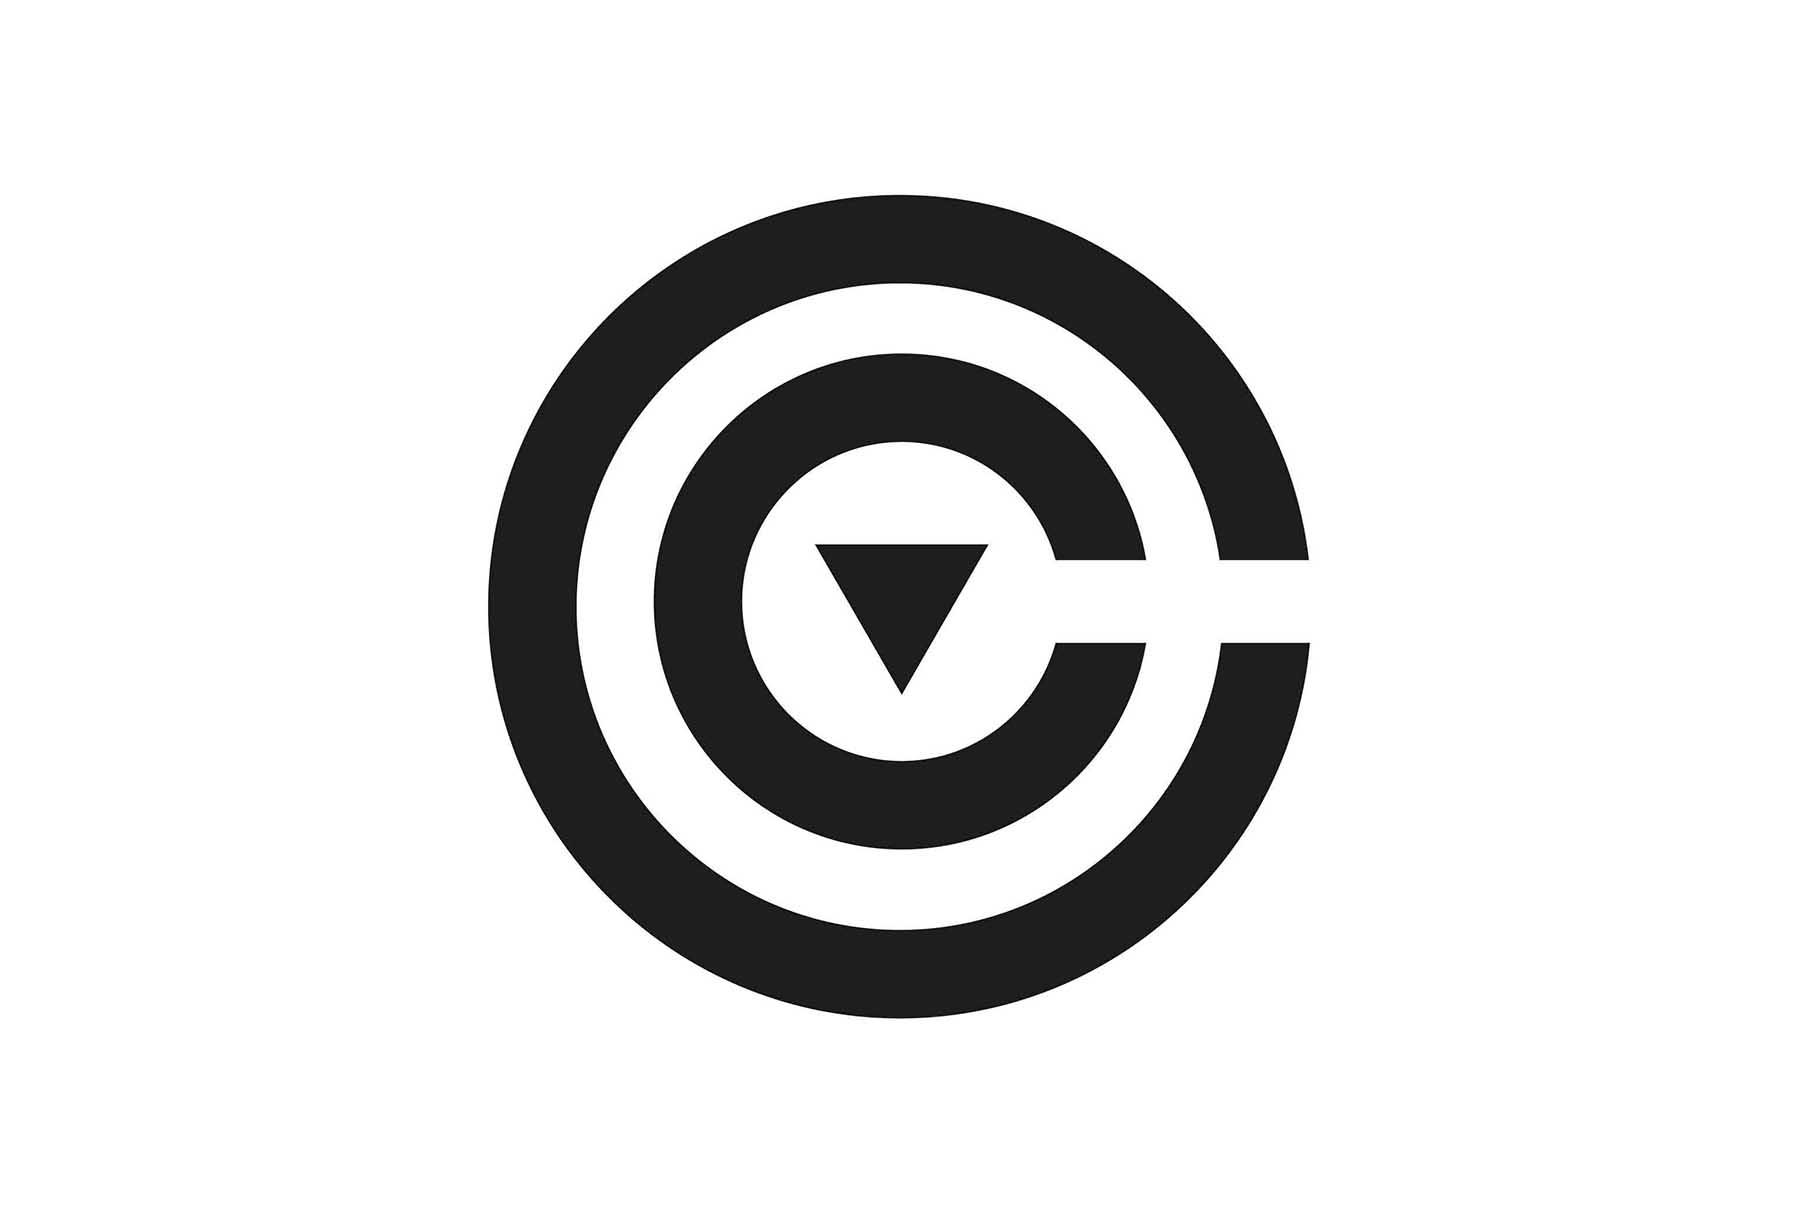 CCV [skica]